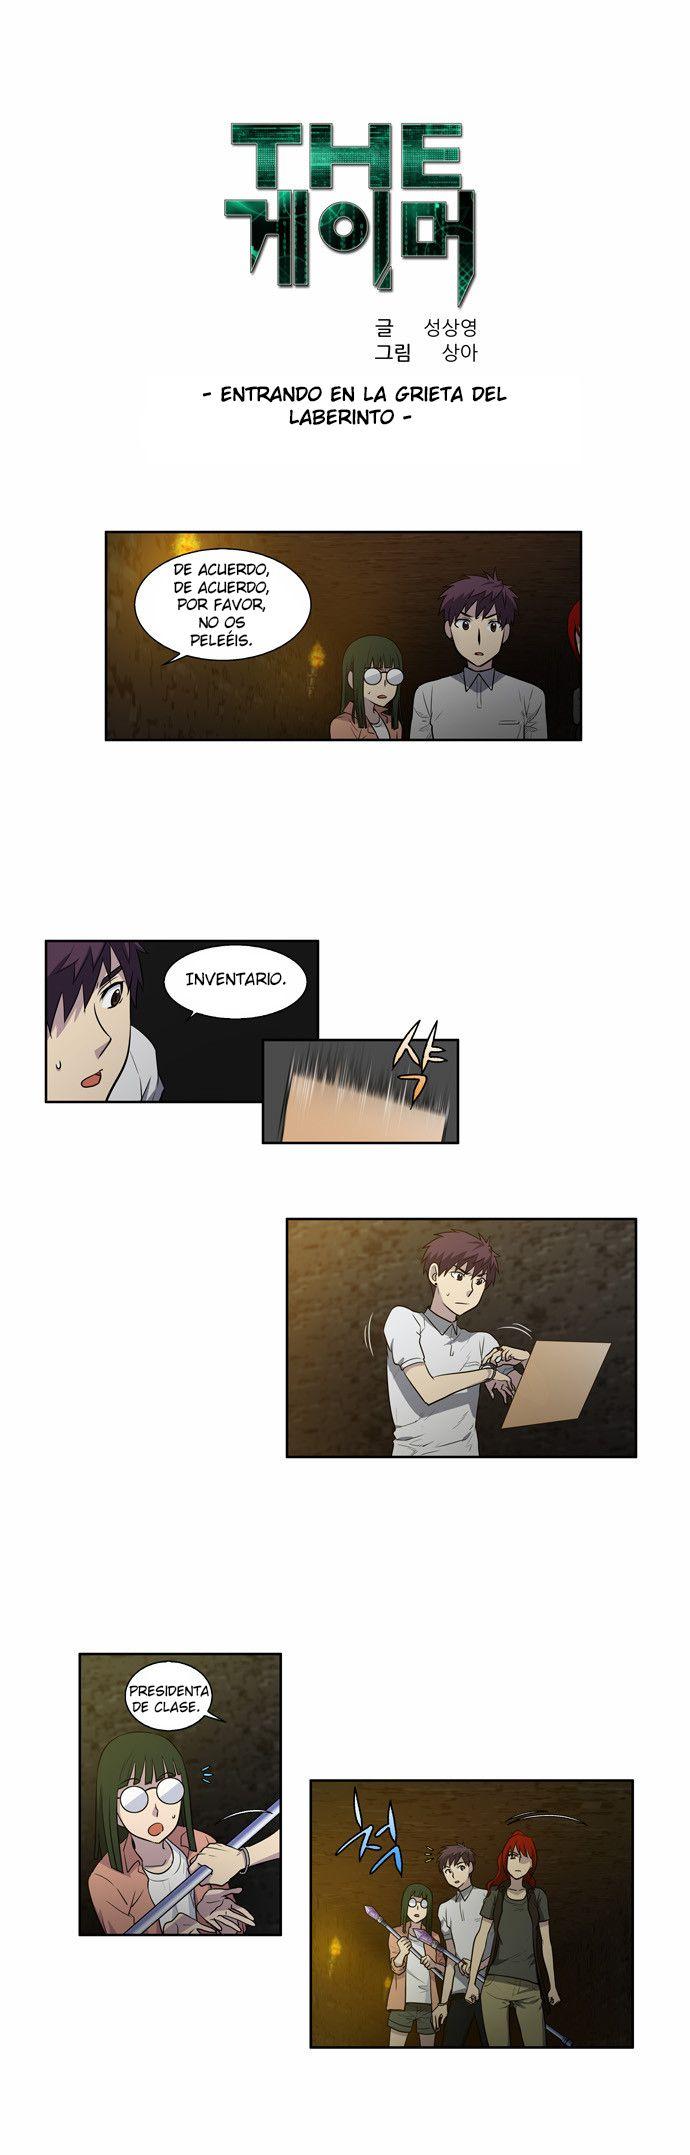 http://c5.ninemanga.com/es_manga/61/1725/479869/7f09ca11be963a091d5de2c2647889c9.jpg Page 2